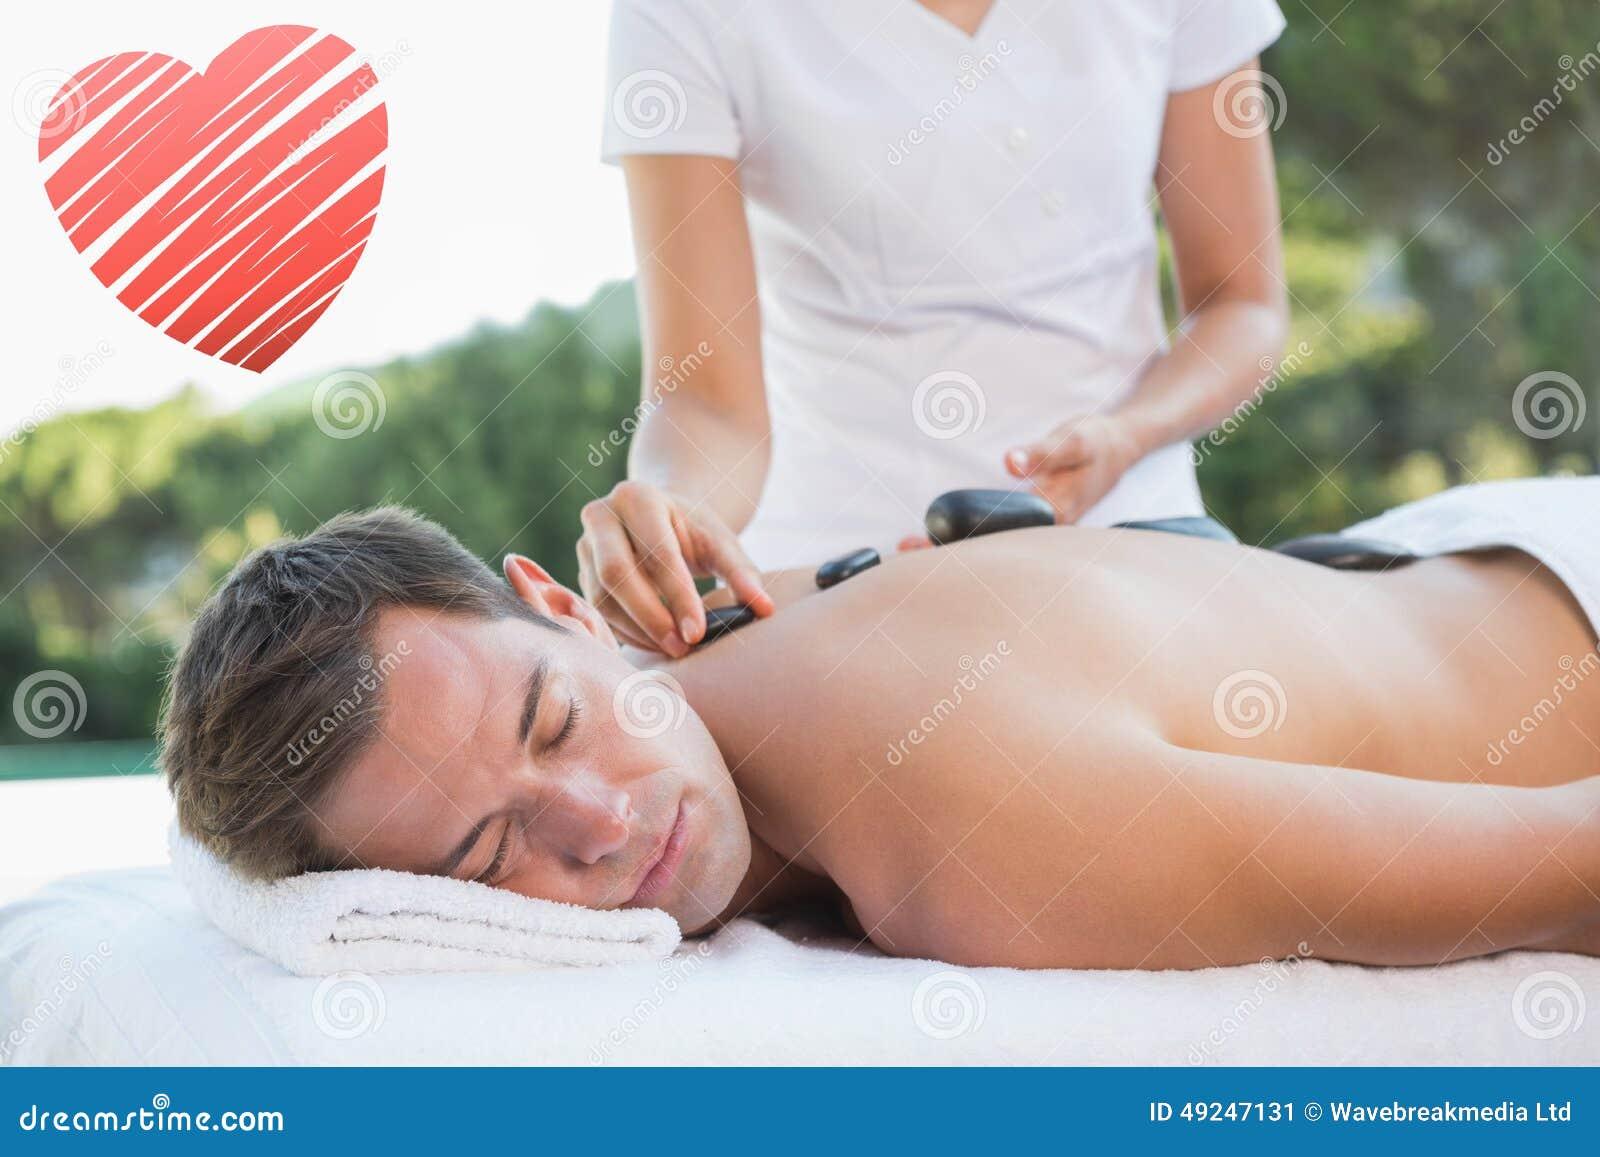 Hot stone massage utah-6874